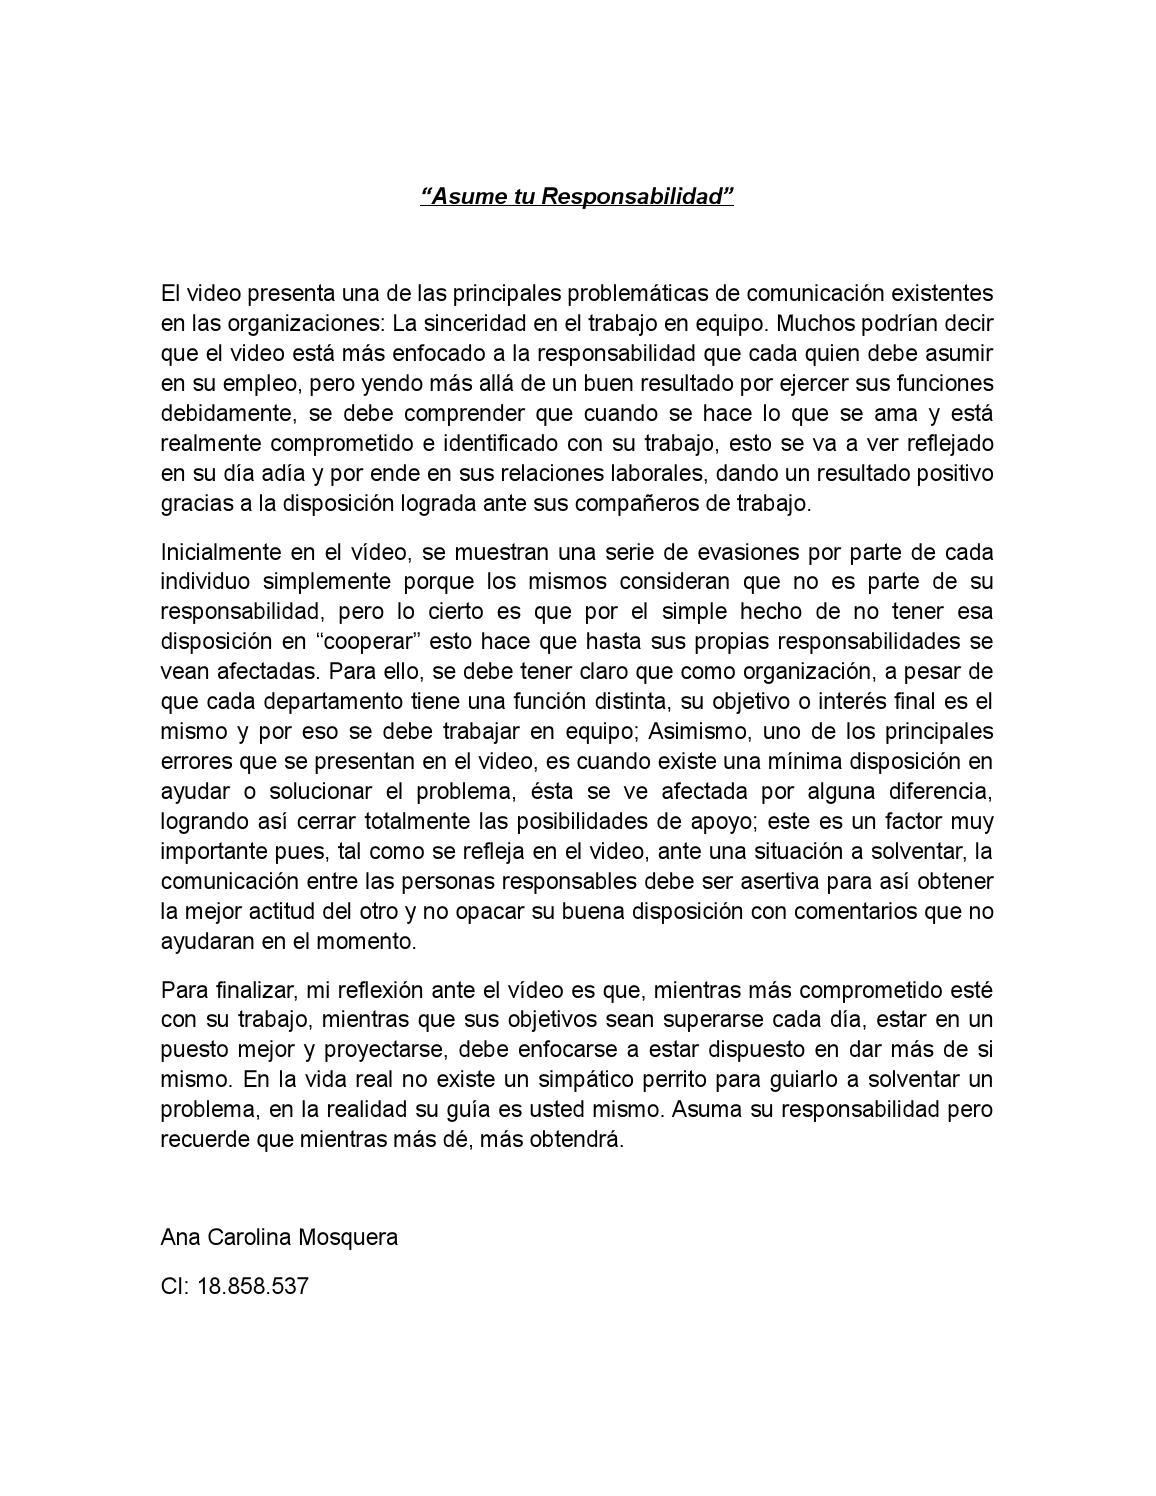 Asume tu responsabilidad by Ana Carolina Mosquera - issuu